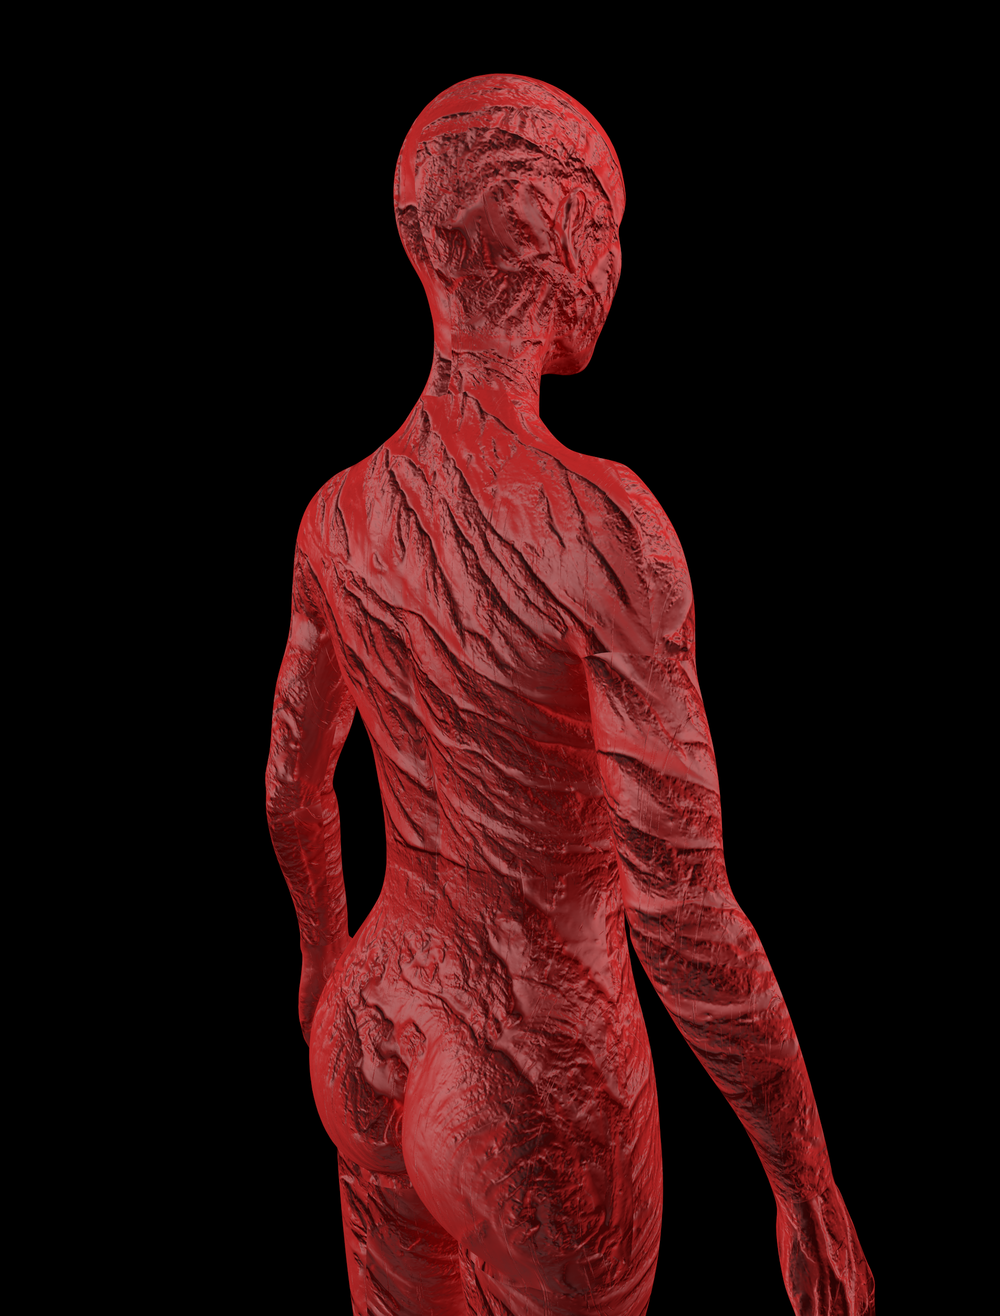 Freddy Kruger Skin Texture / Material